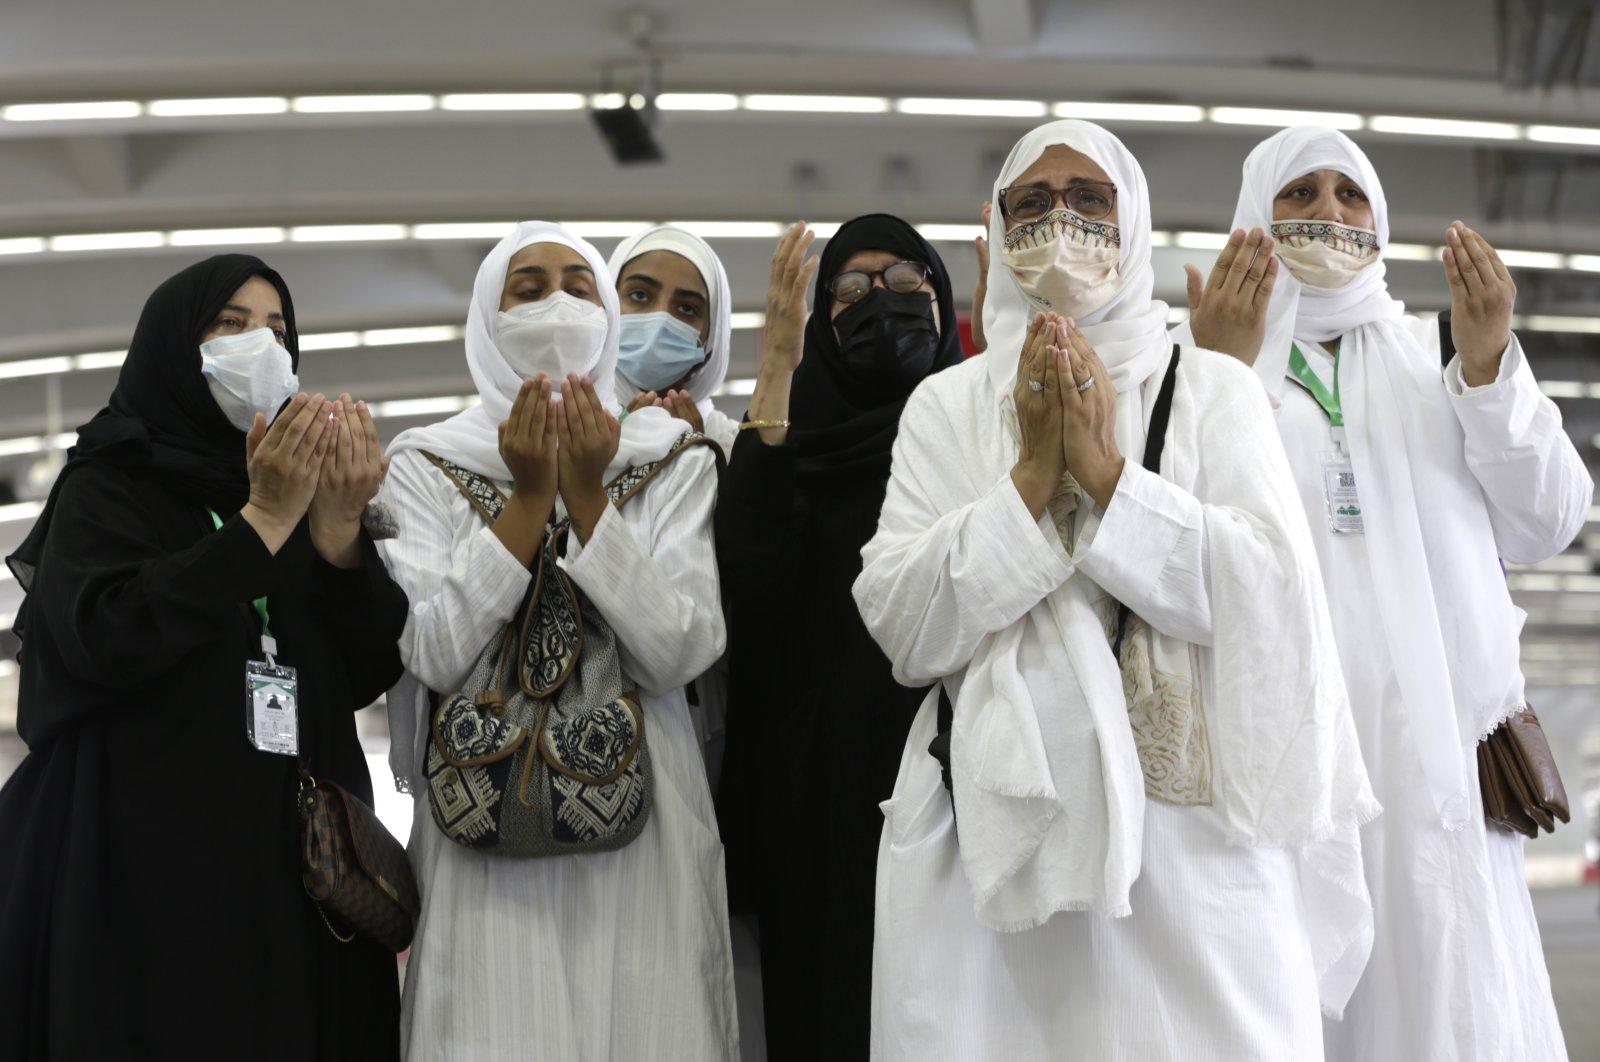 Muslim pilgrims pray during the symbolic stoning of the devil ritual during the hajj pilgrimage in Mina, near the holy city of Mecca, Saudi Arabia, July 20, 2021. (AP Photo)